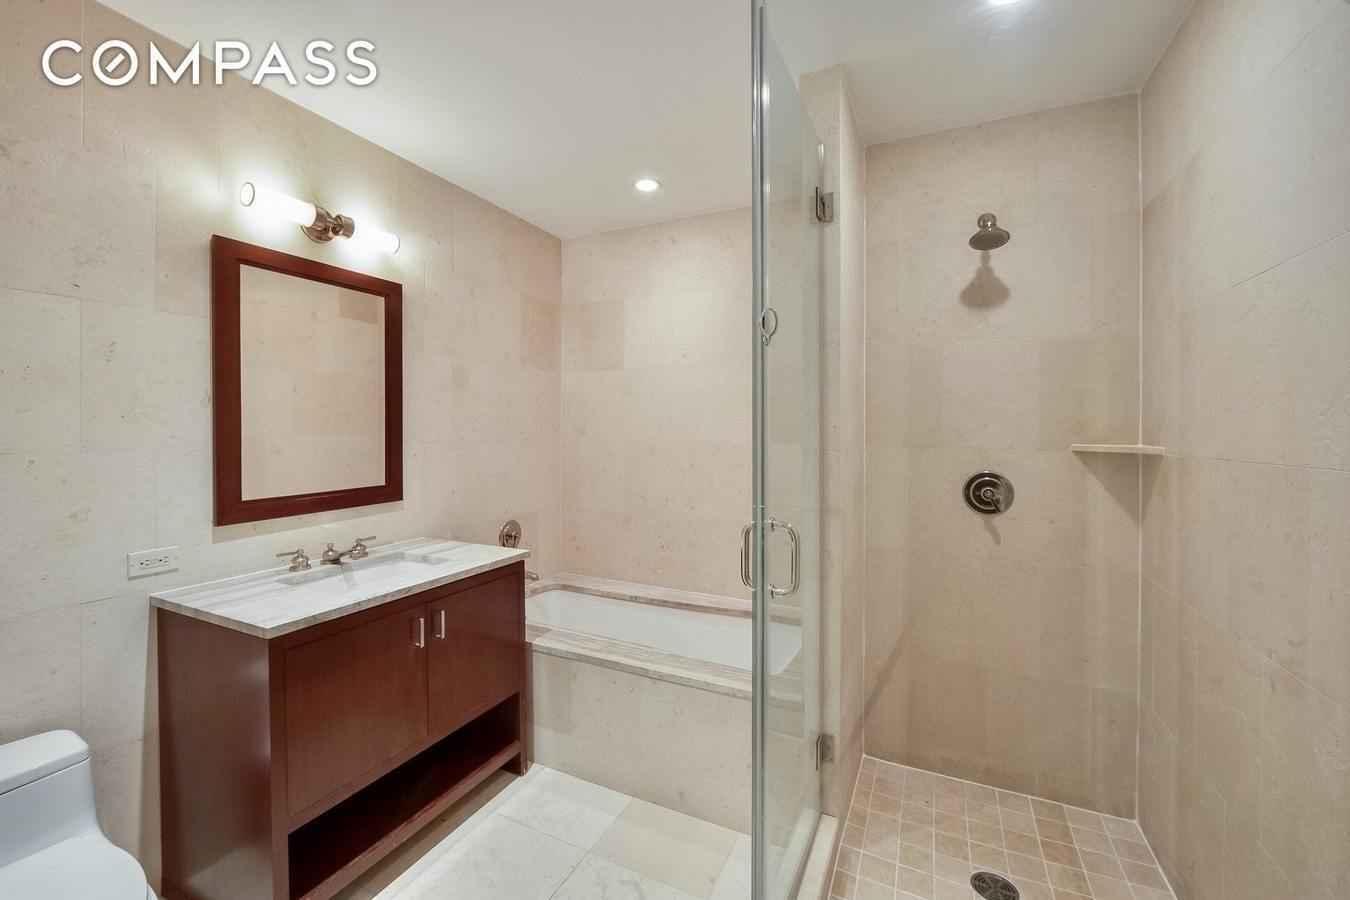 Apartment for sale at 100 Riverside Boulevard, Apt 10-T